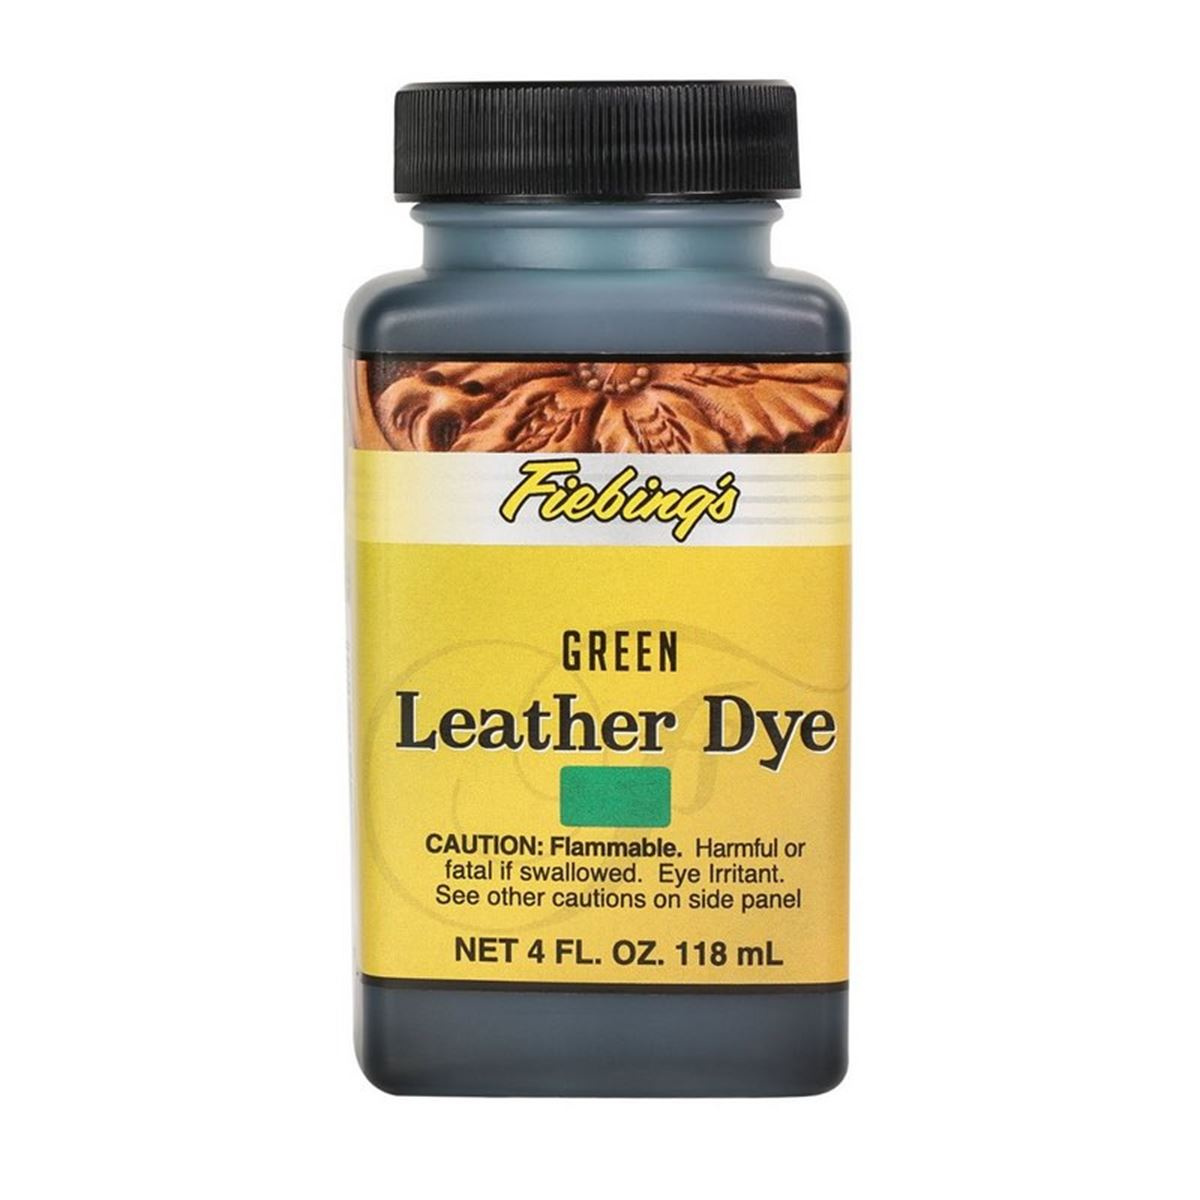 Teinture pour cuir FIEBING'S Leather dye - VERT - GREEN